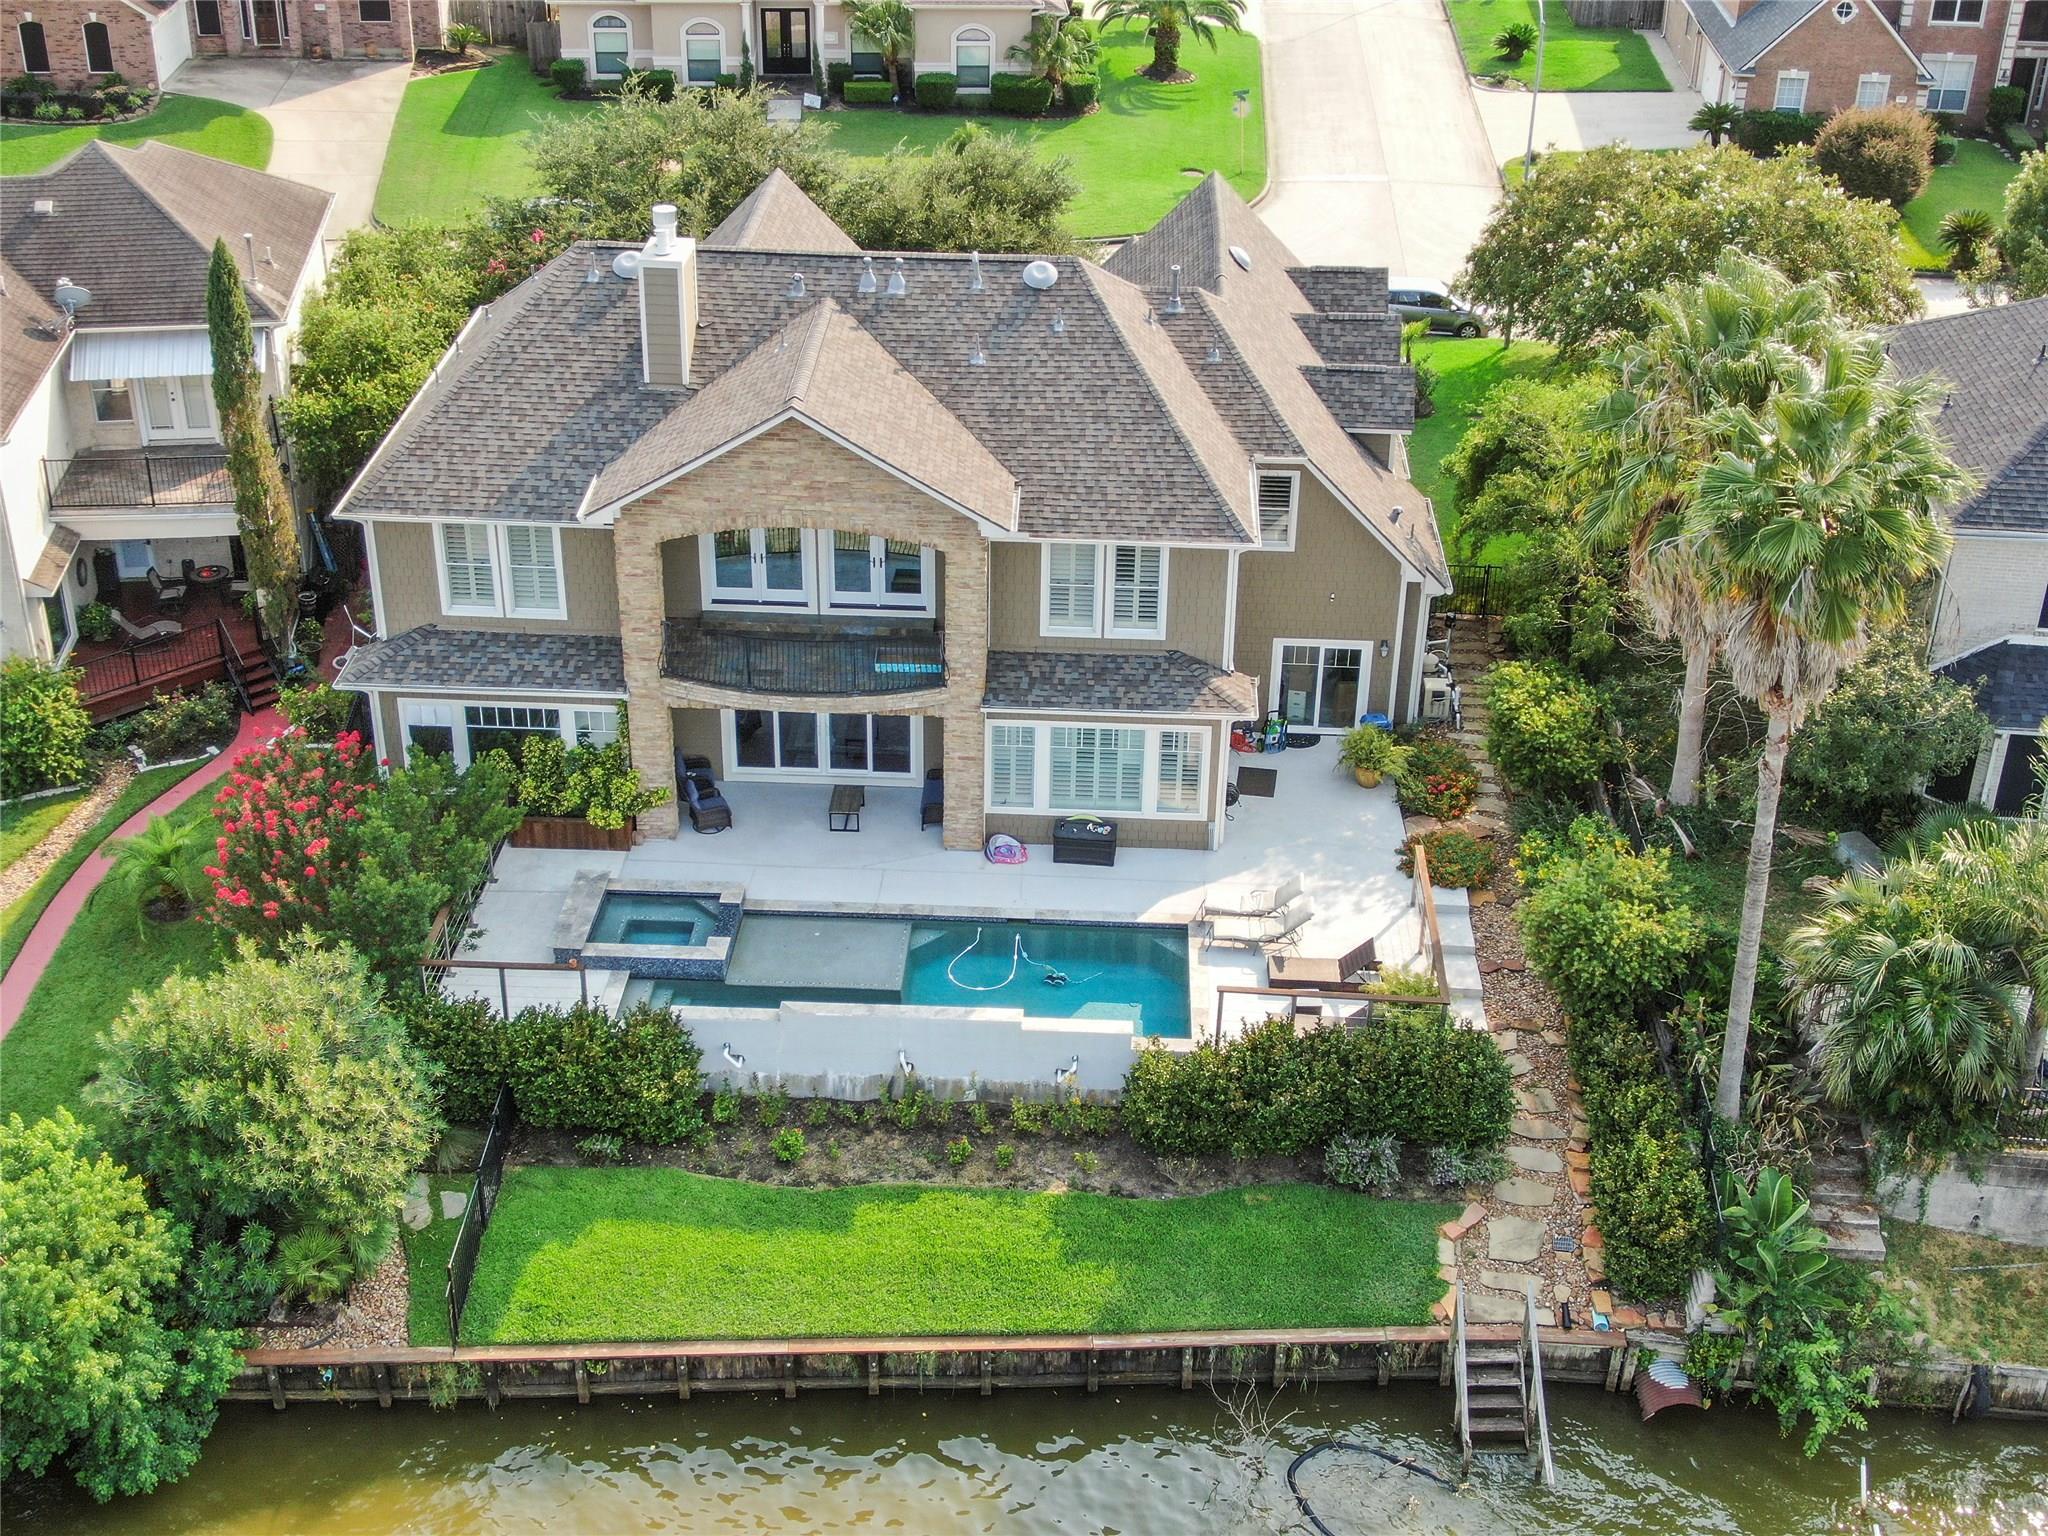 19015 Aquatic Drive Property Photo - Houston, TX real estate listing